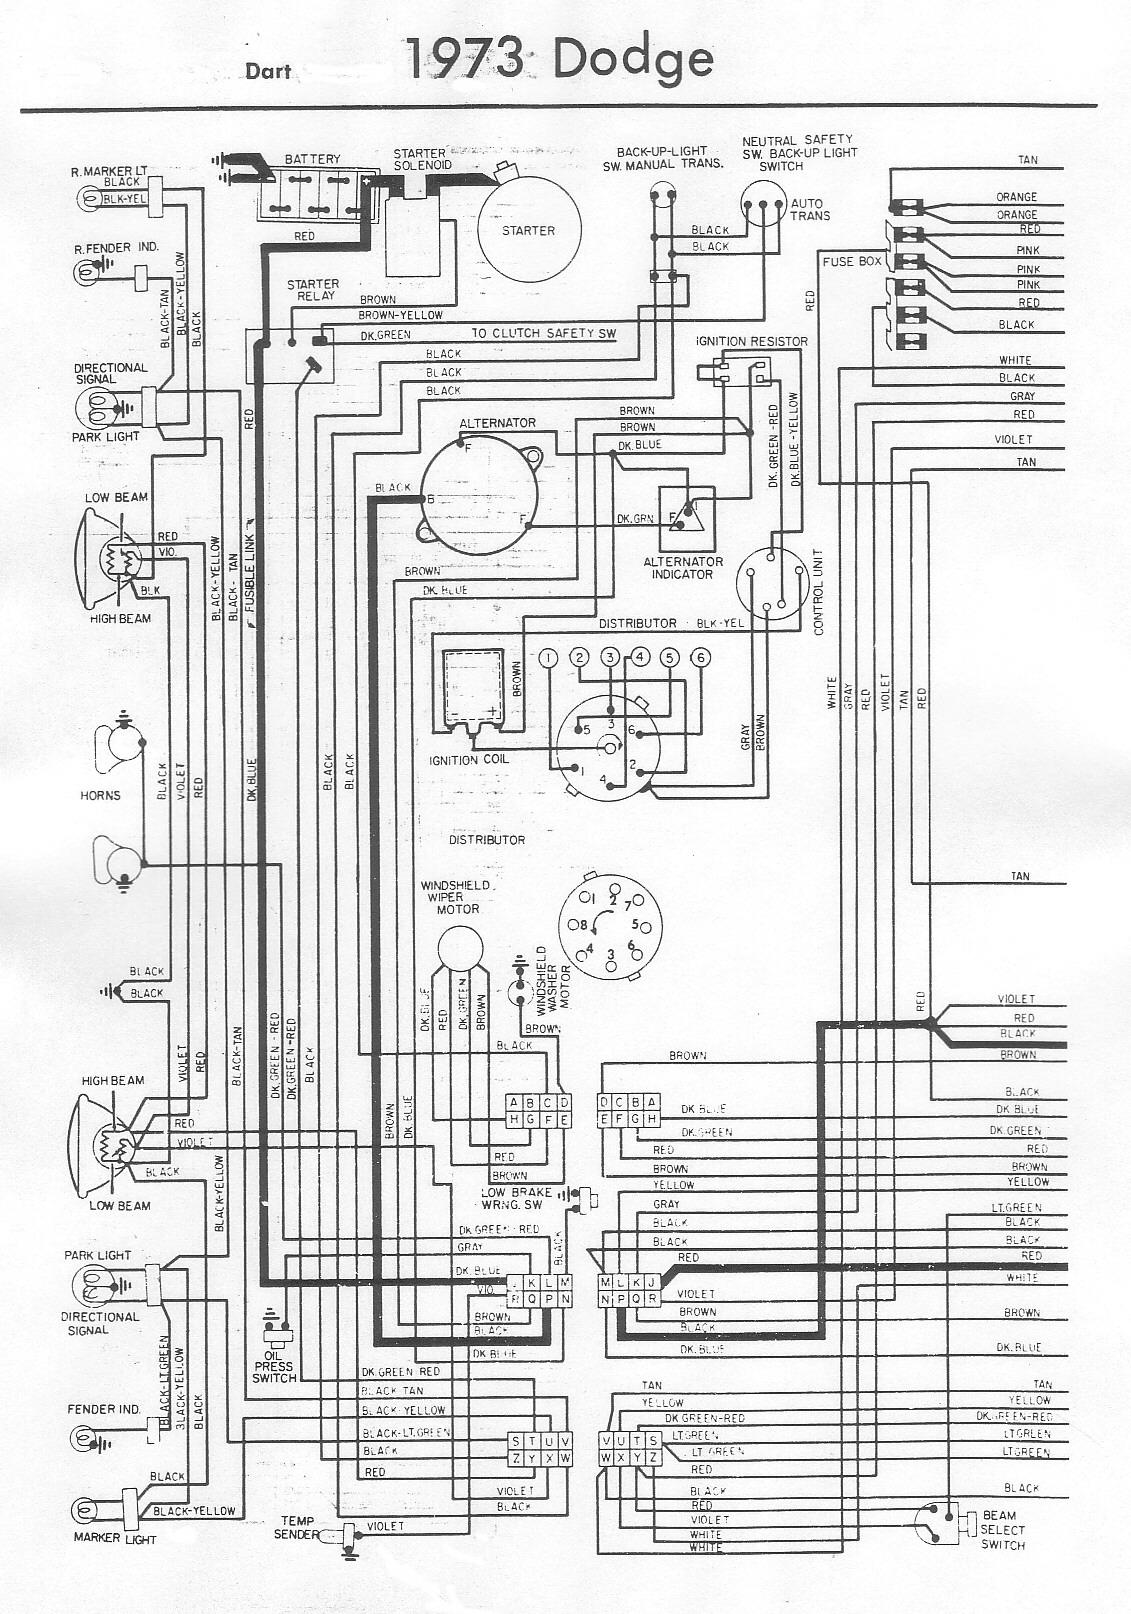 1970 Dodge Dart Fuse Box Wiring Diagram Wiring Diagram View A View A Zaafran It